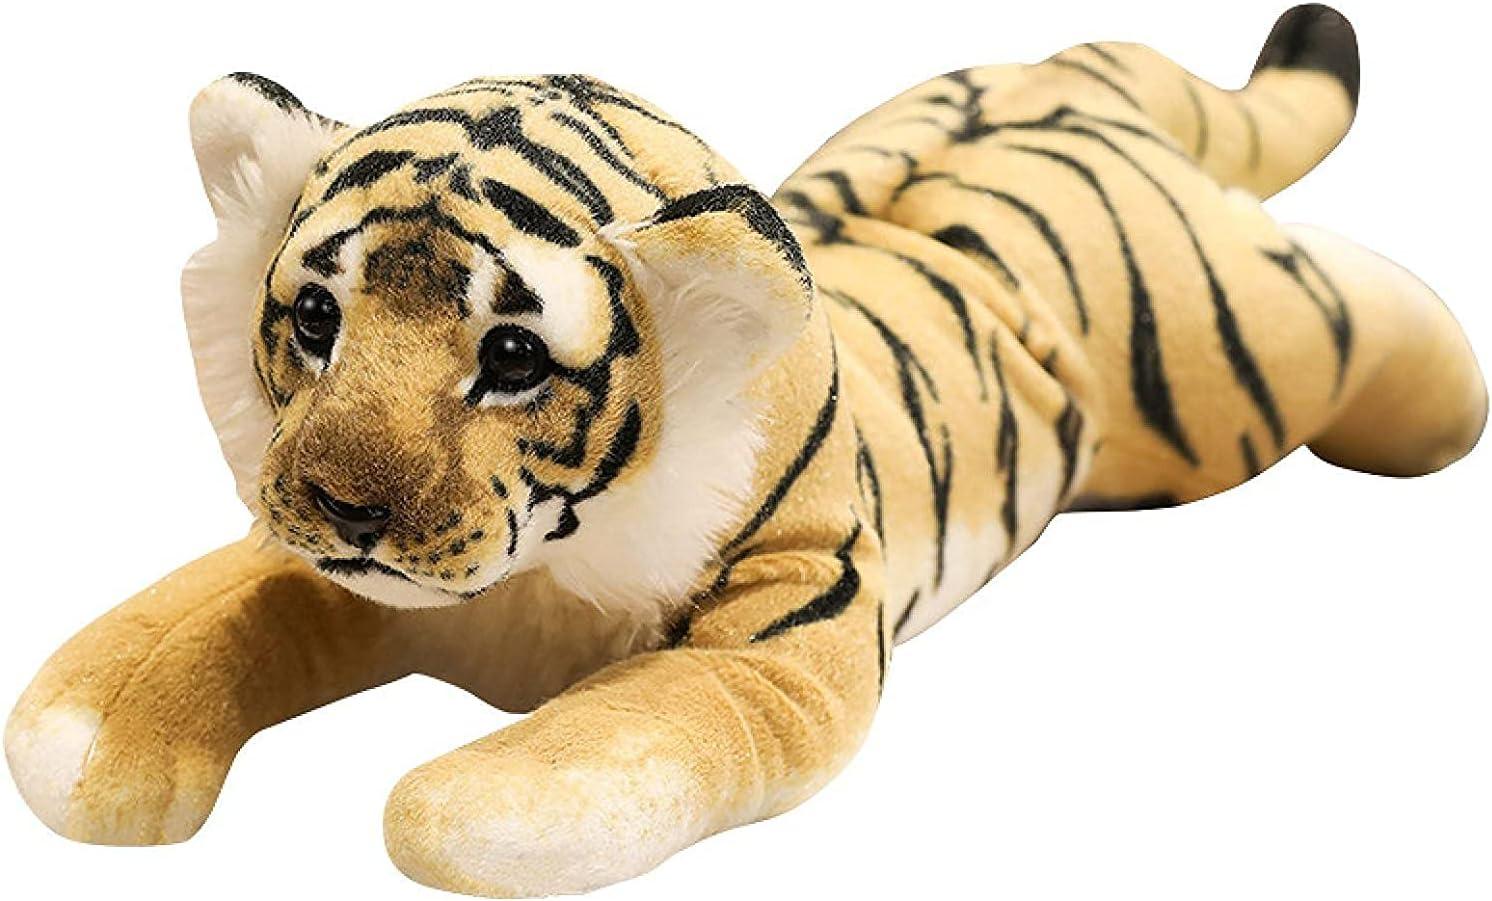 YQCX Tiger Toy Premium Soft Hugging Stuffed Cute Bargain service Pillow Cotton